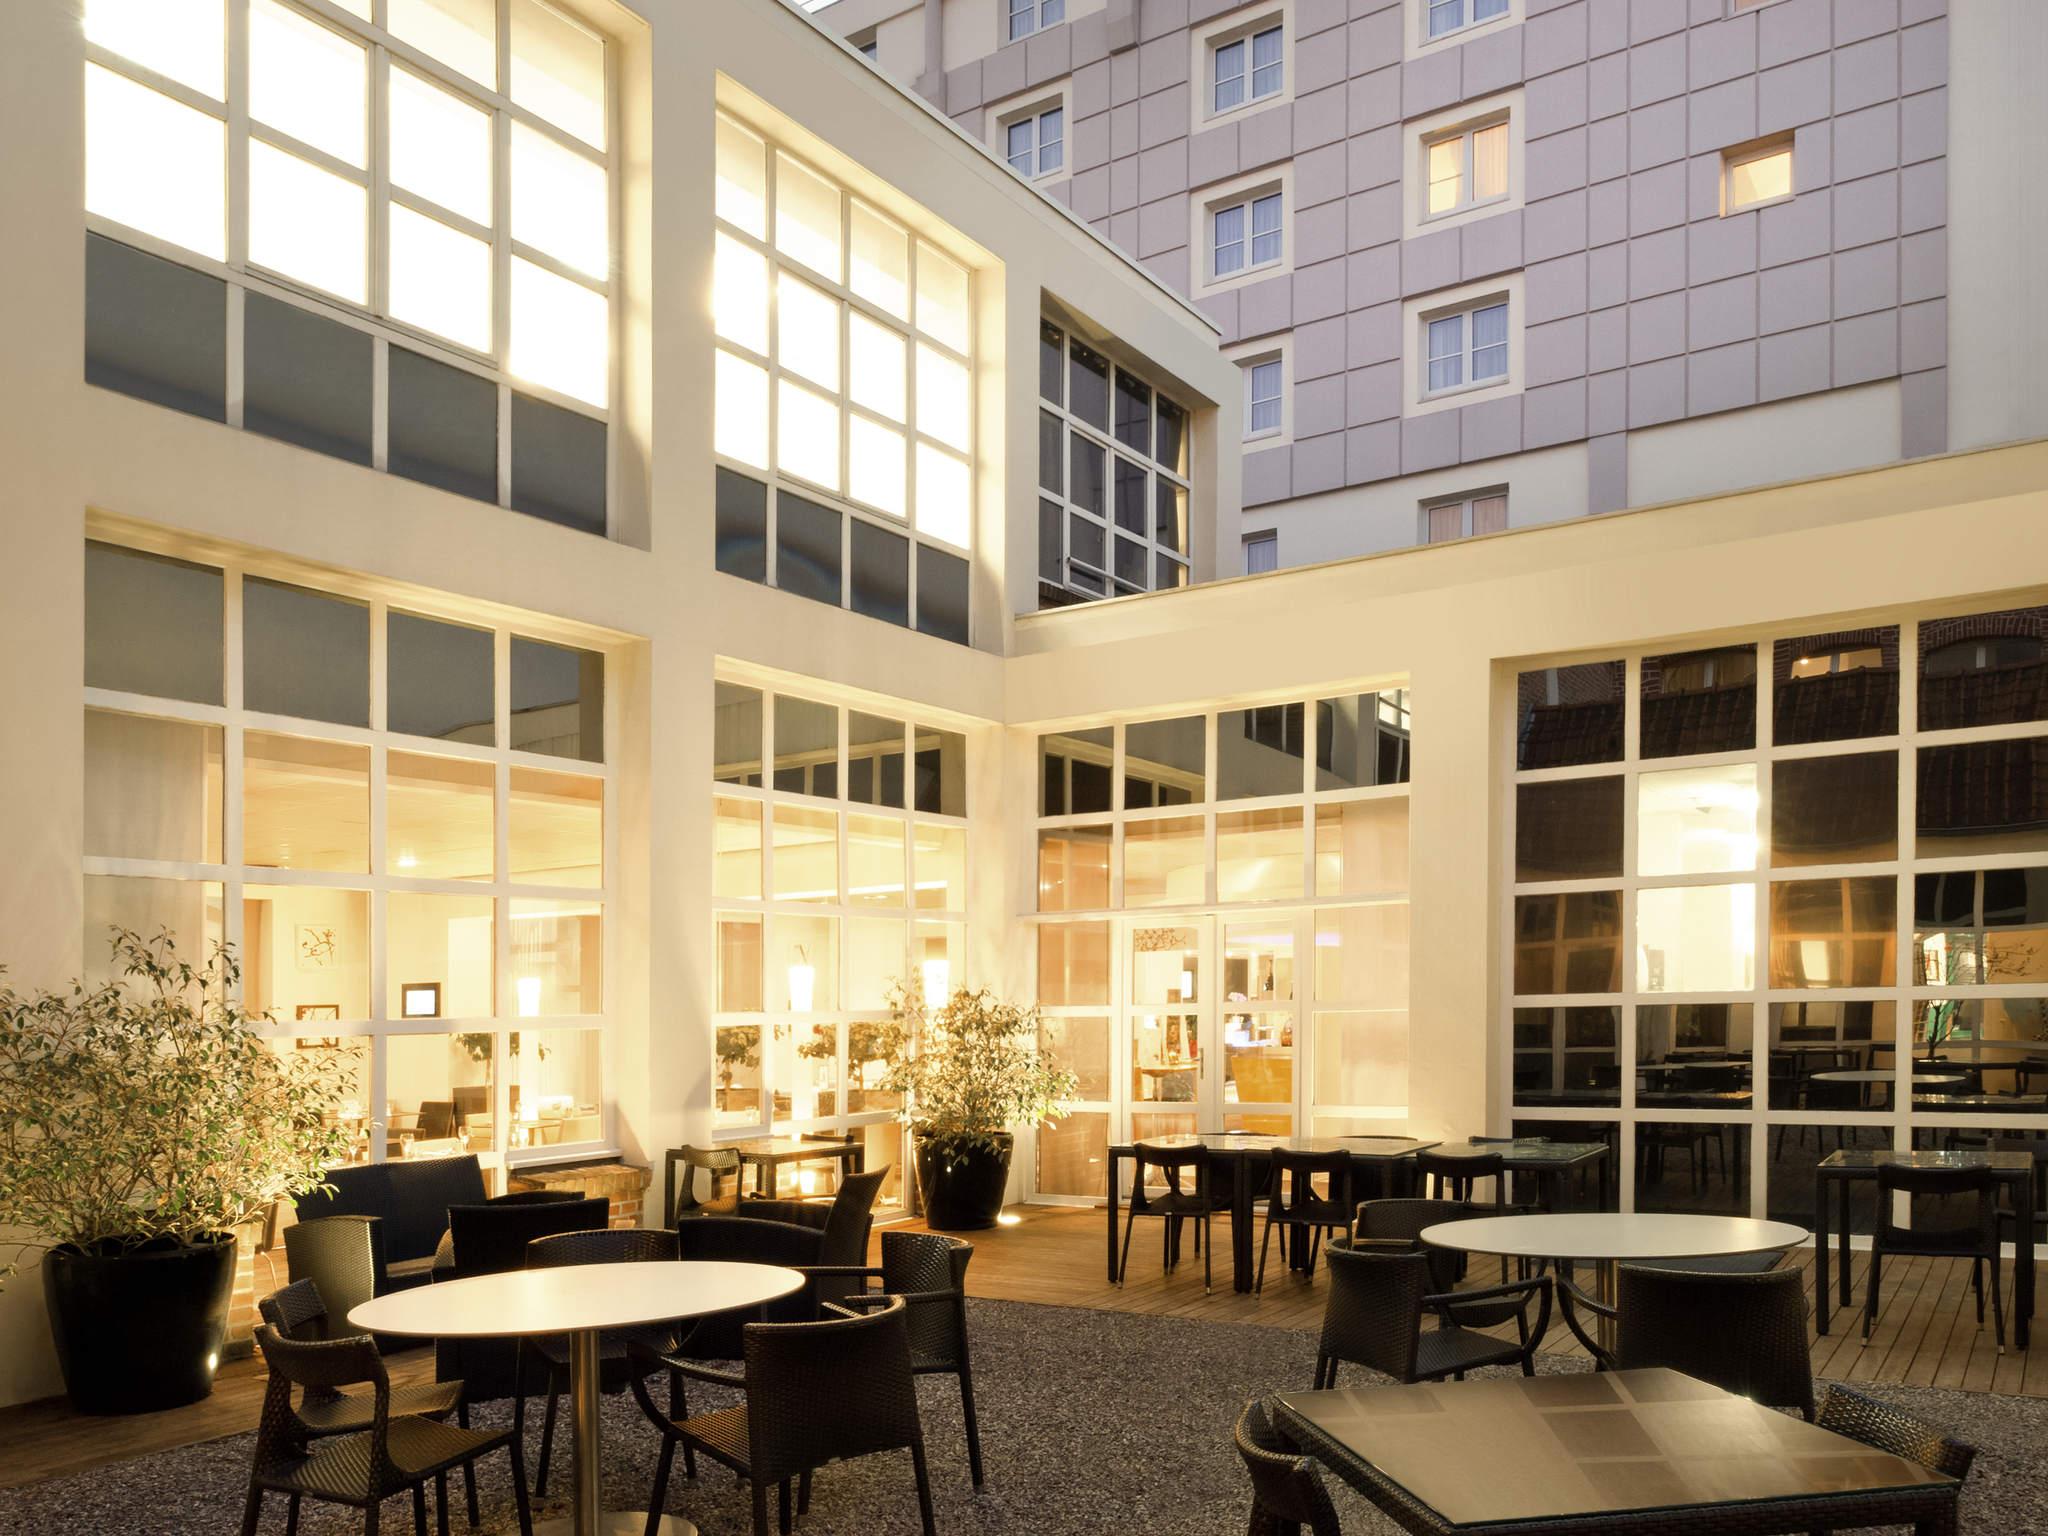 Hotel – Novotel Lille Centre Grand Place